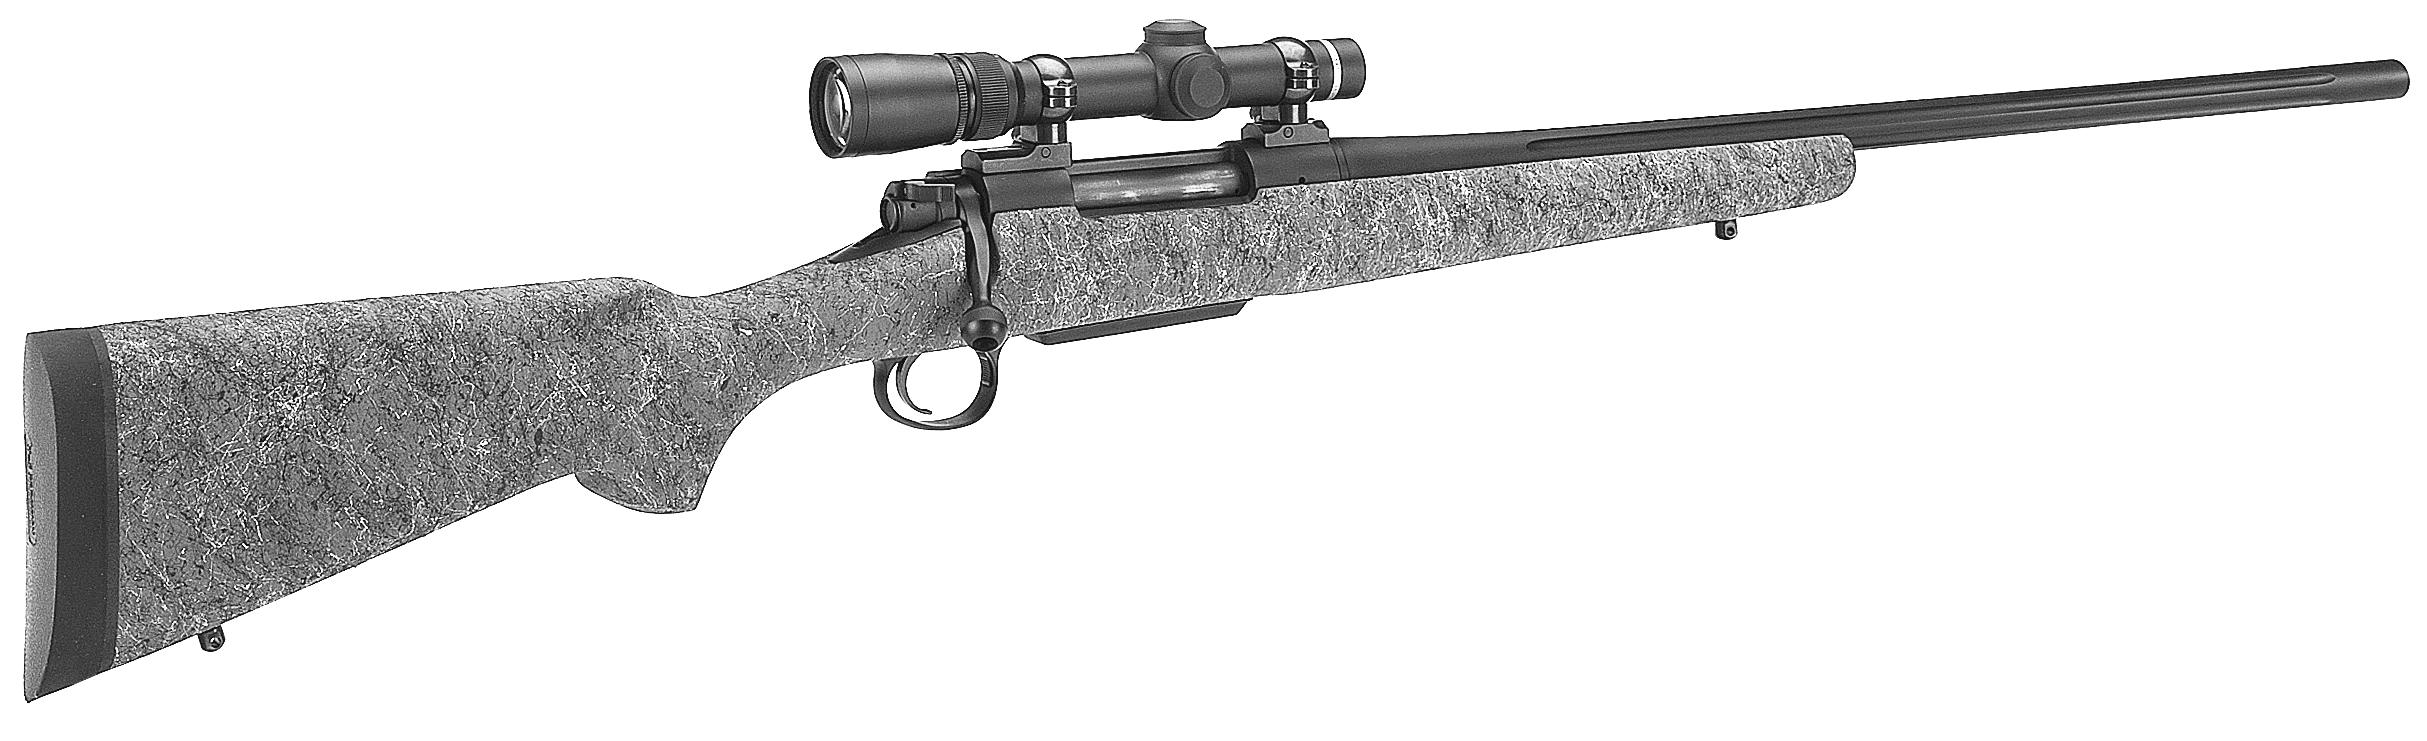 PHR Professional Hunter Rifle